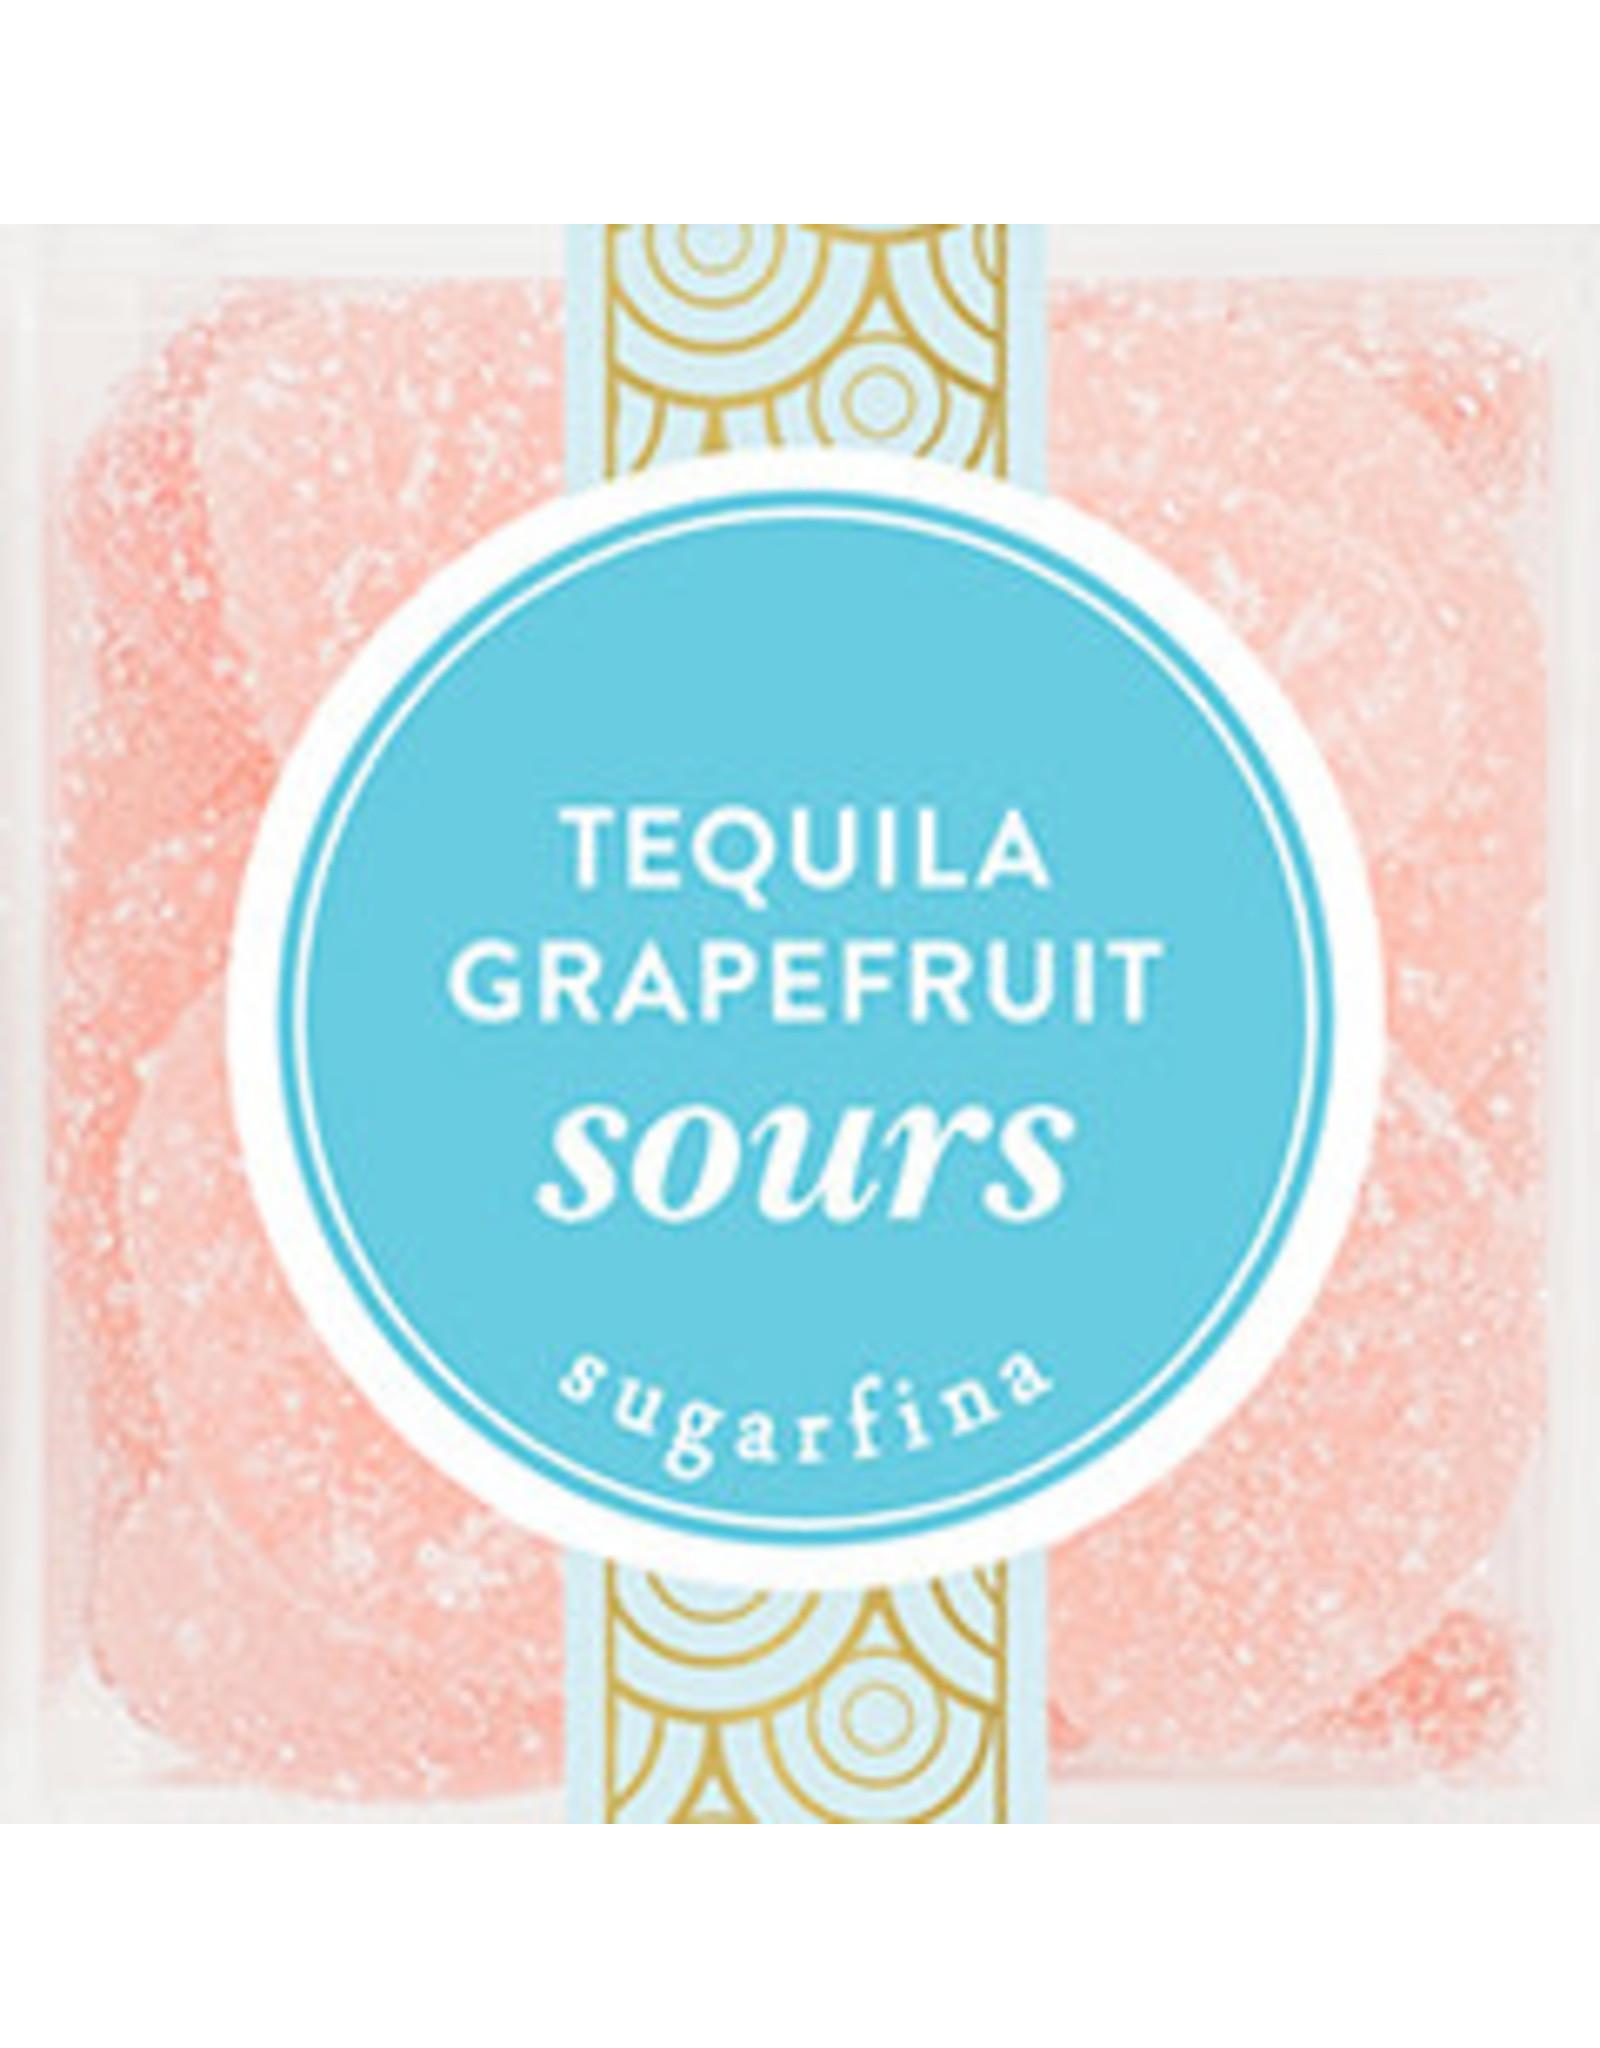 Sugarfina Tequila Grapefruit Sours